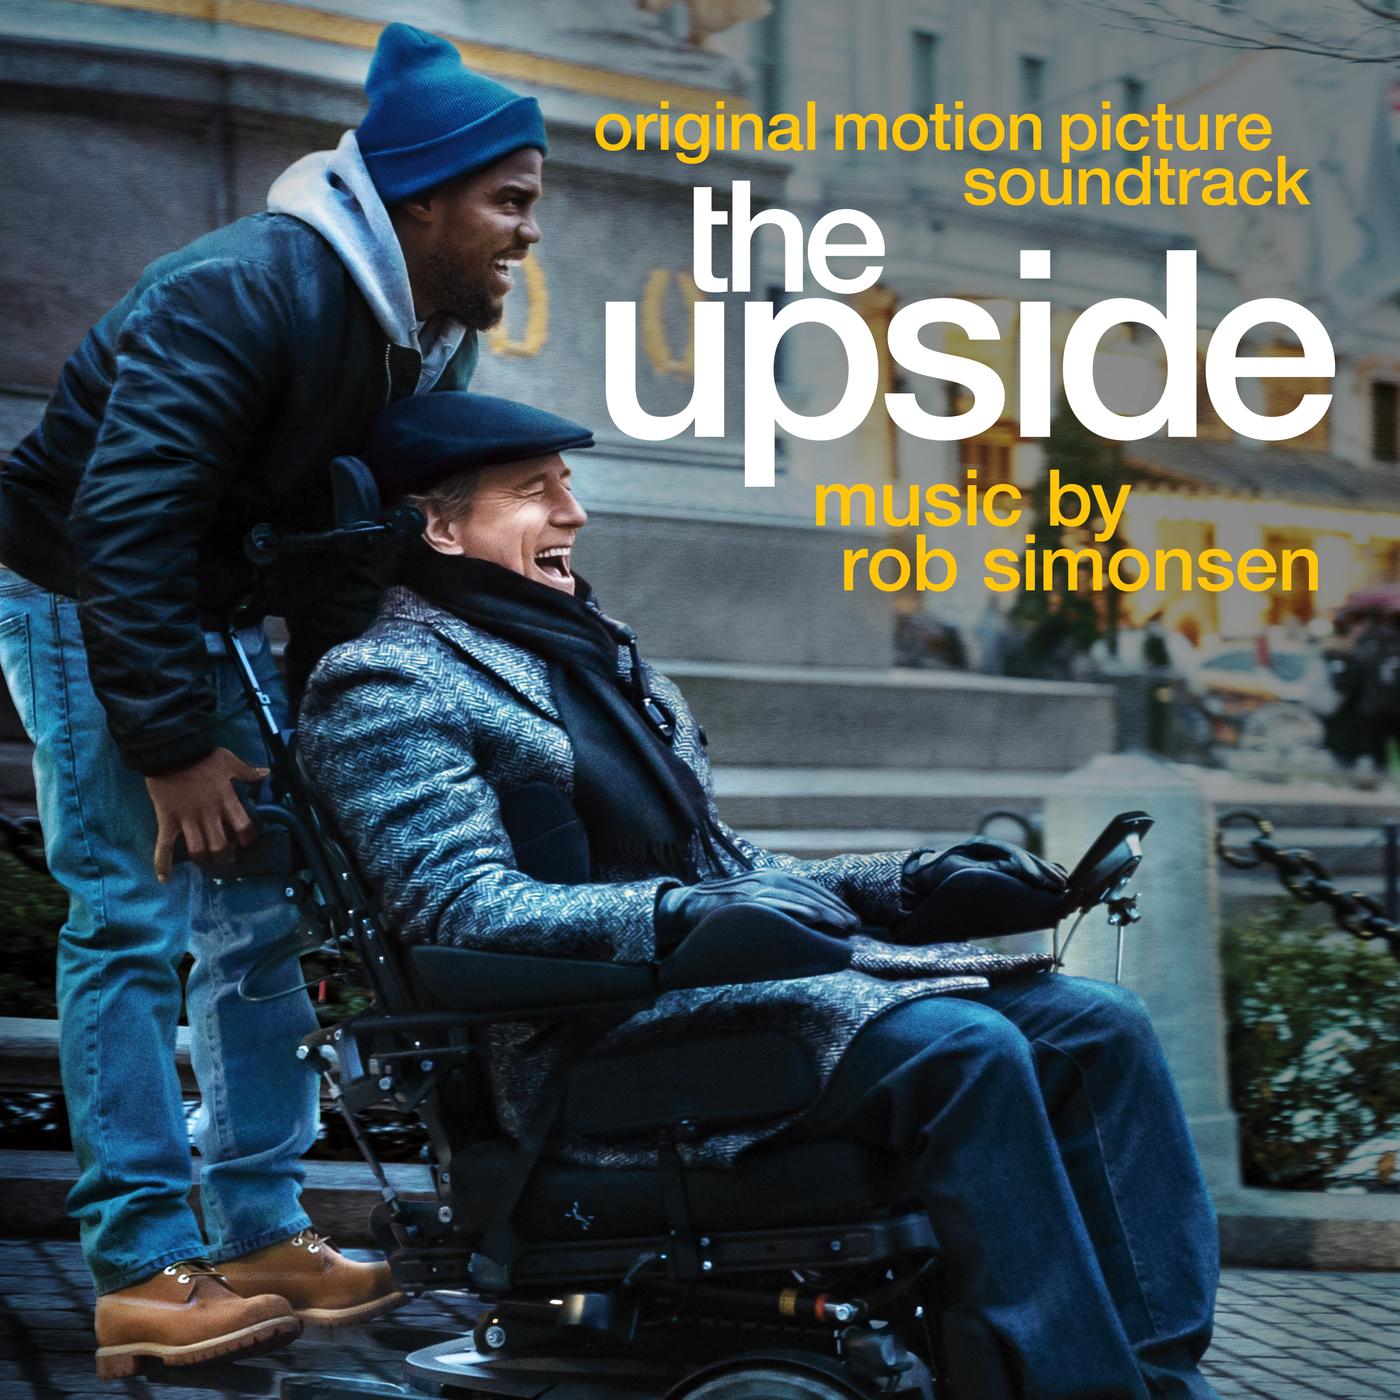 The Upside (Original Motion Picture Soundtrack) - Rob Simonsen